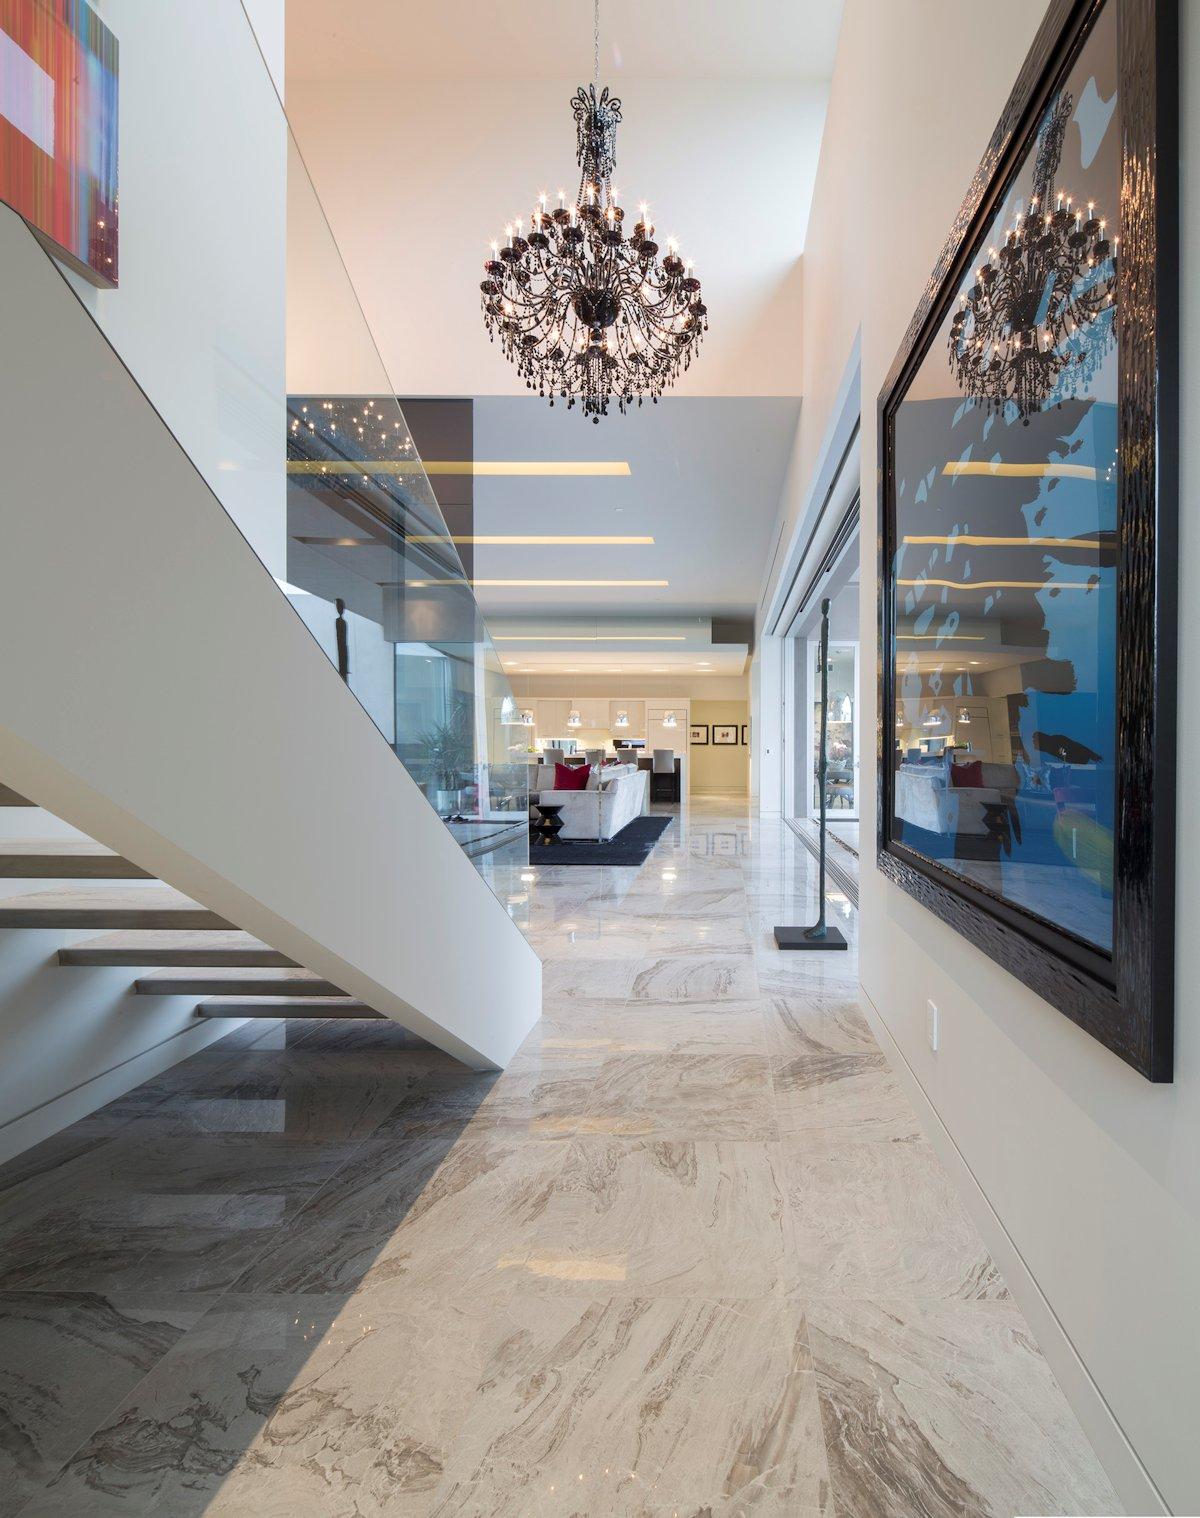 Stairs, Art, Chandeliers, Mid-Century Modern Home in Scottsdale, Arizona